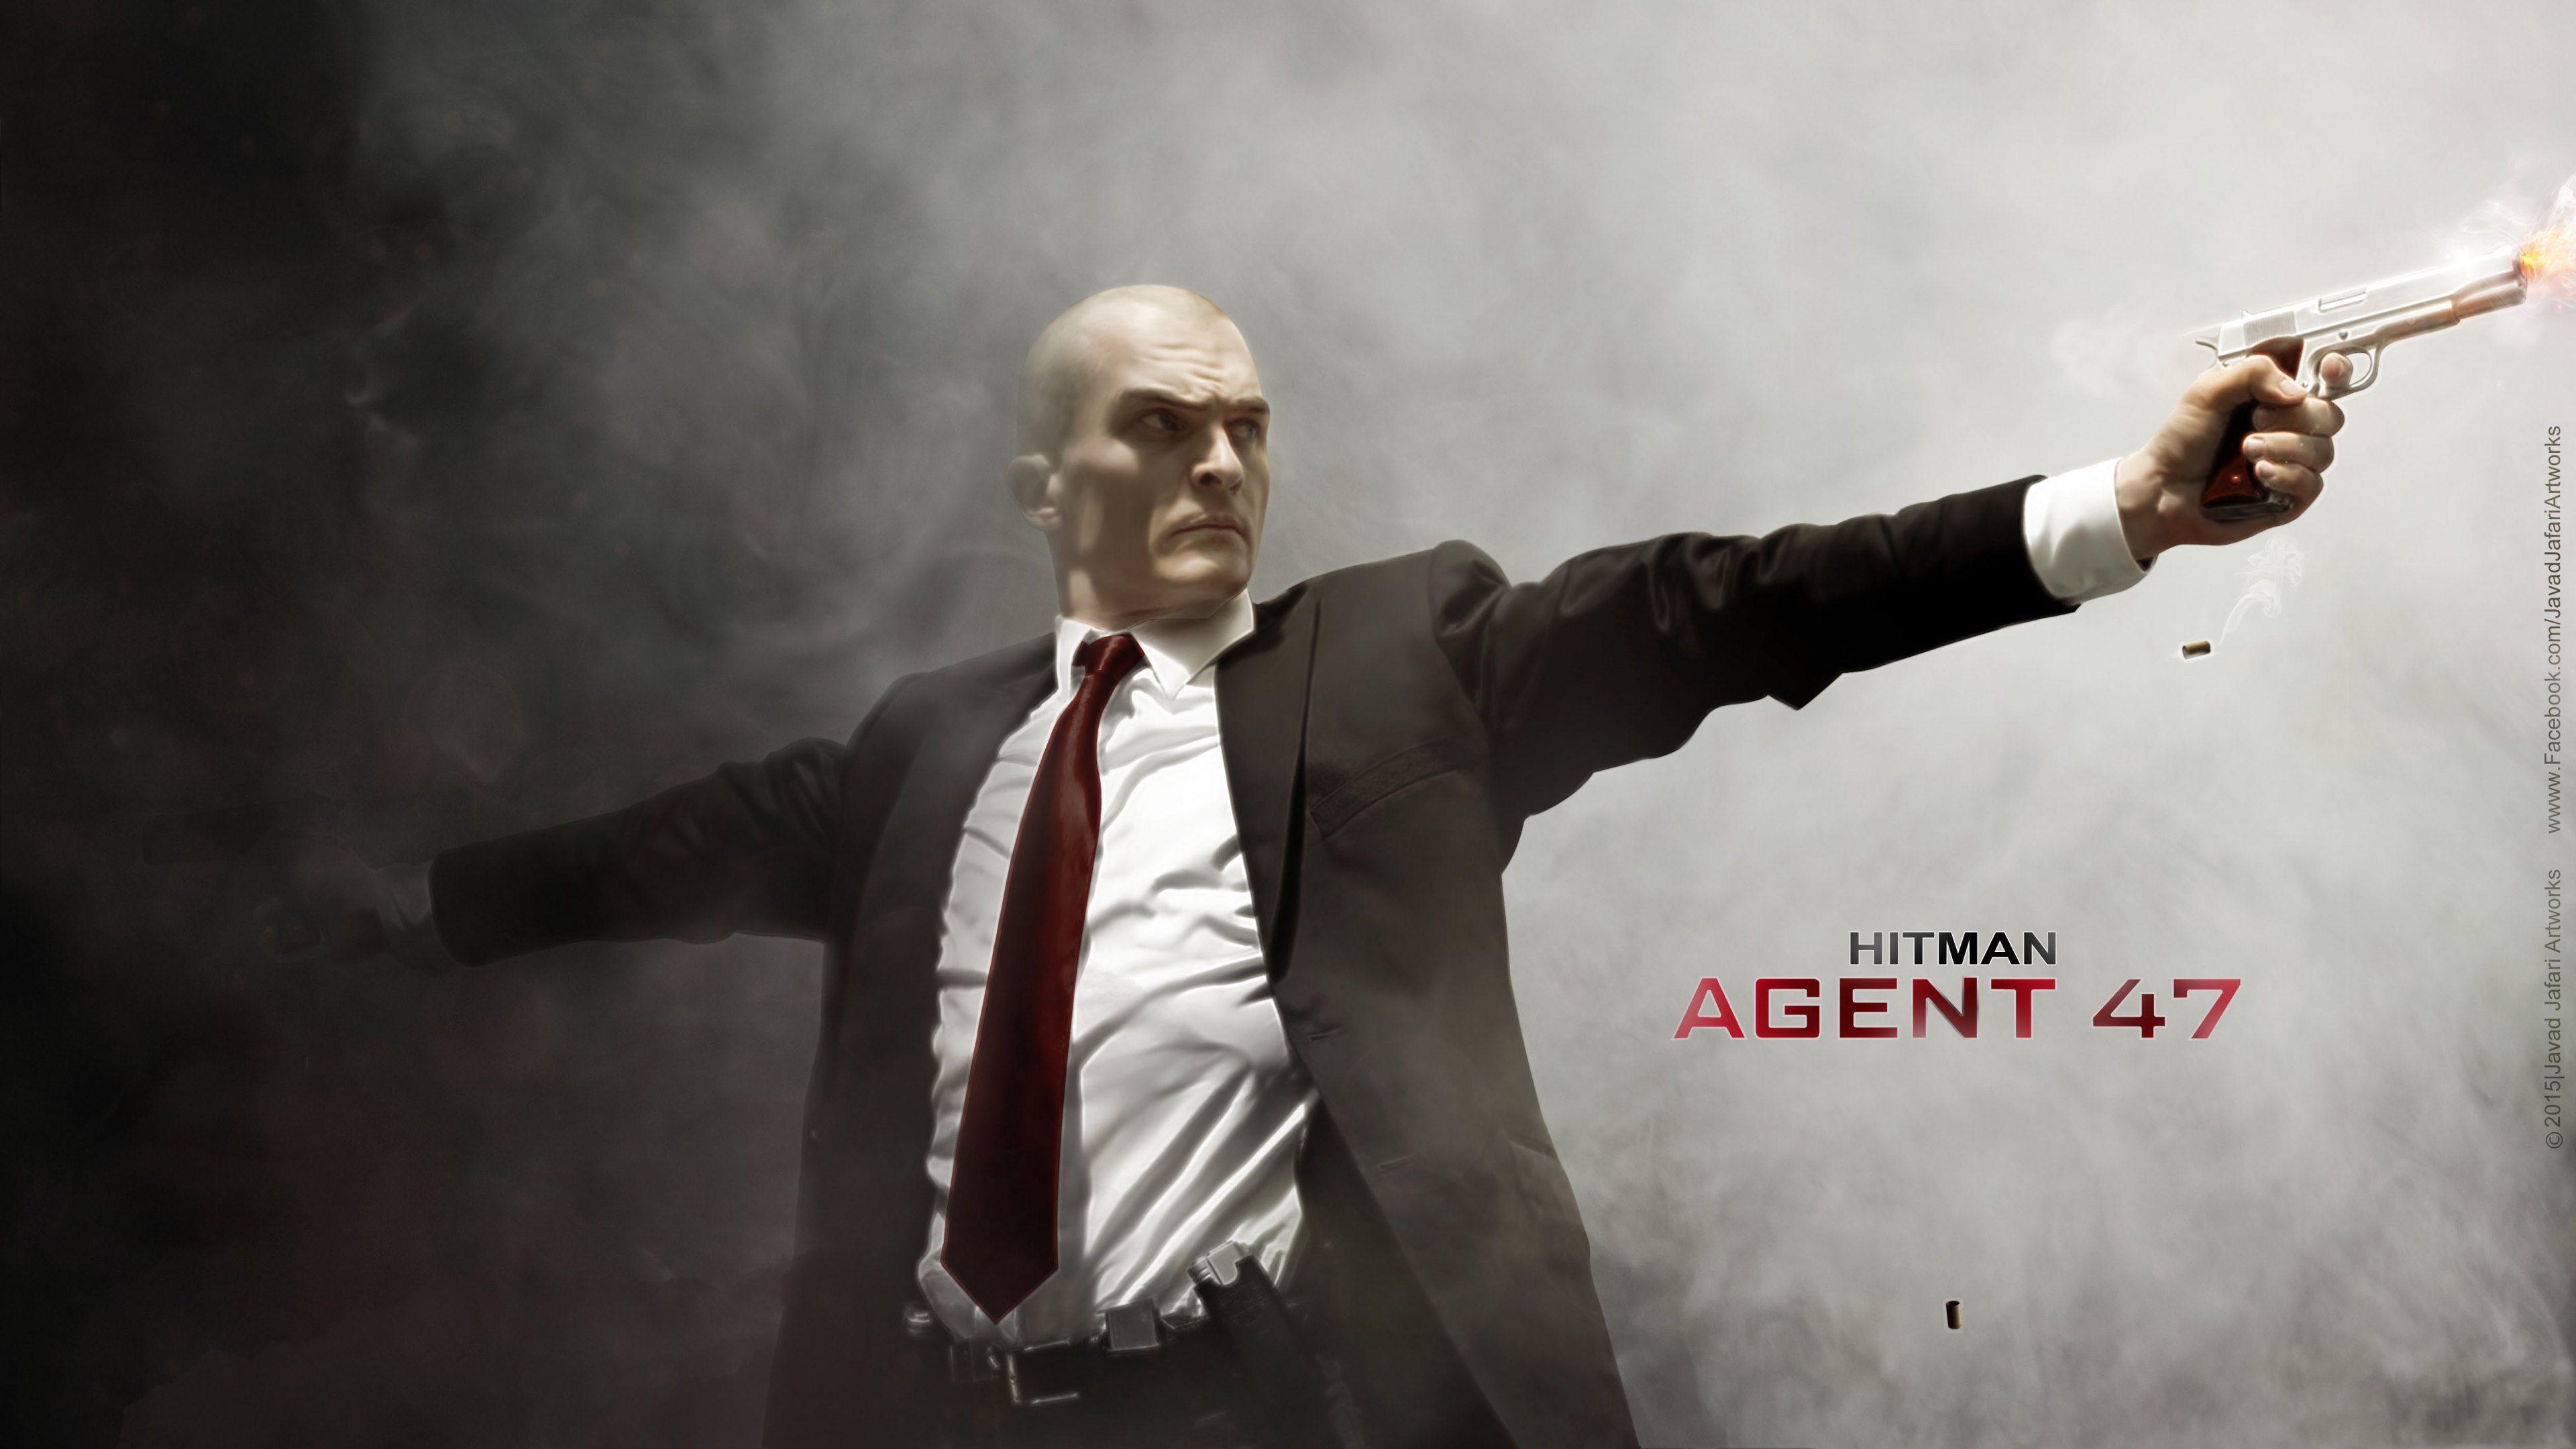 640509 040147 Hitman Agent 47 Hitman Movie Agent 47